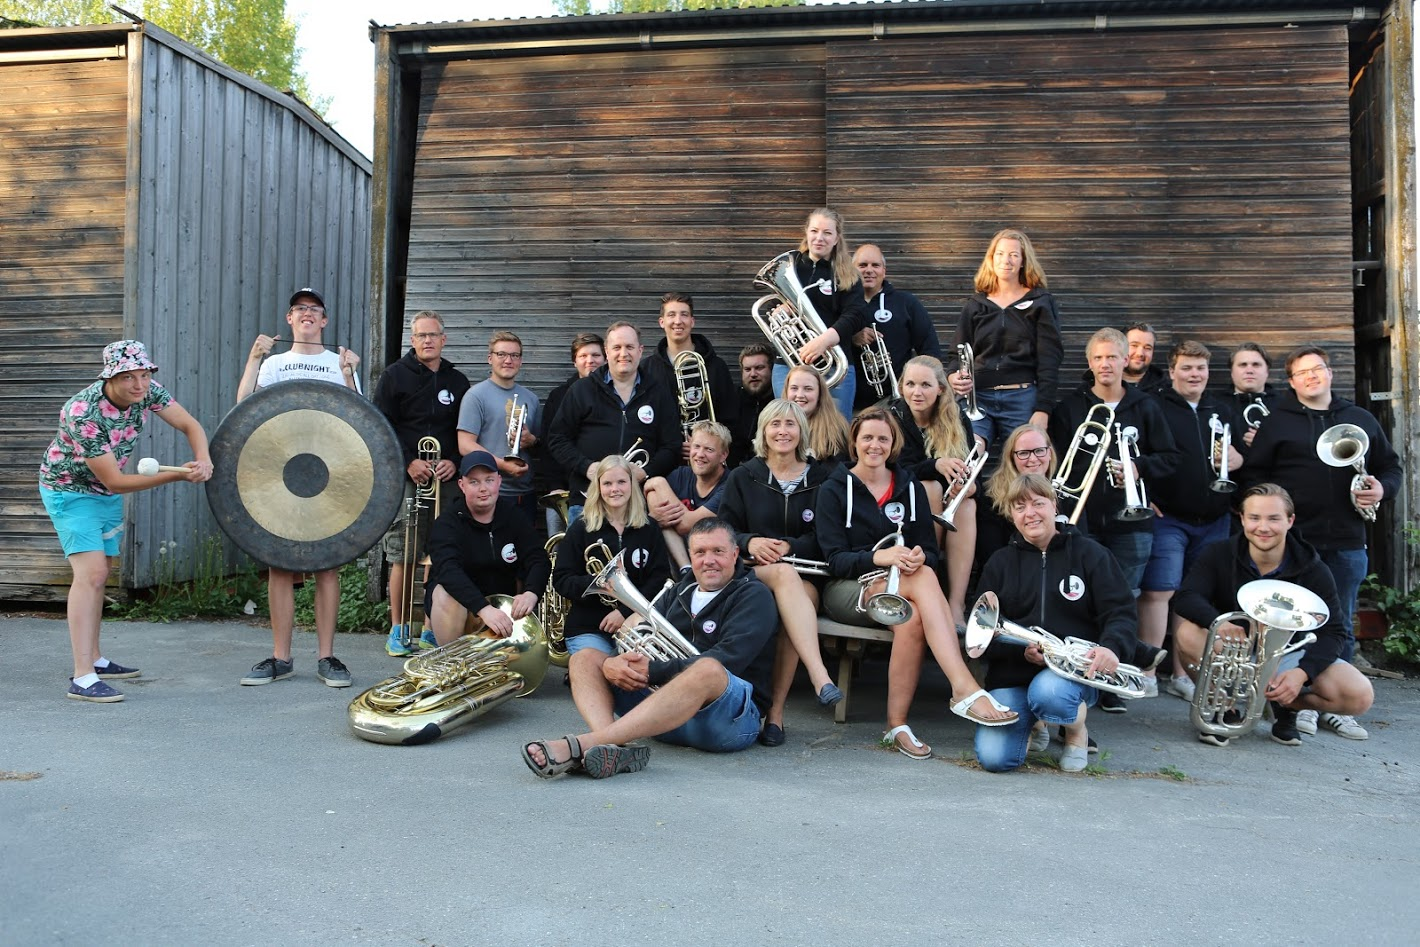 Foto: Petter Sveen